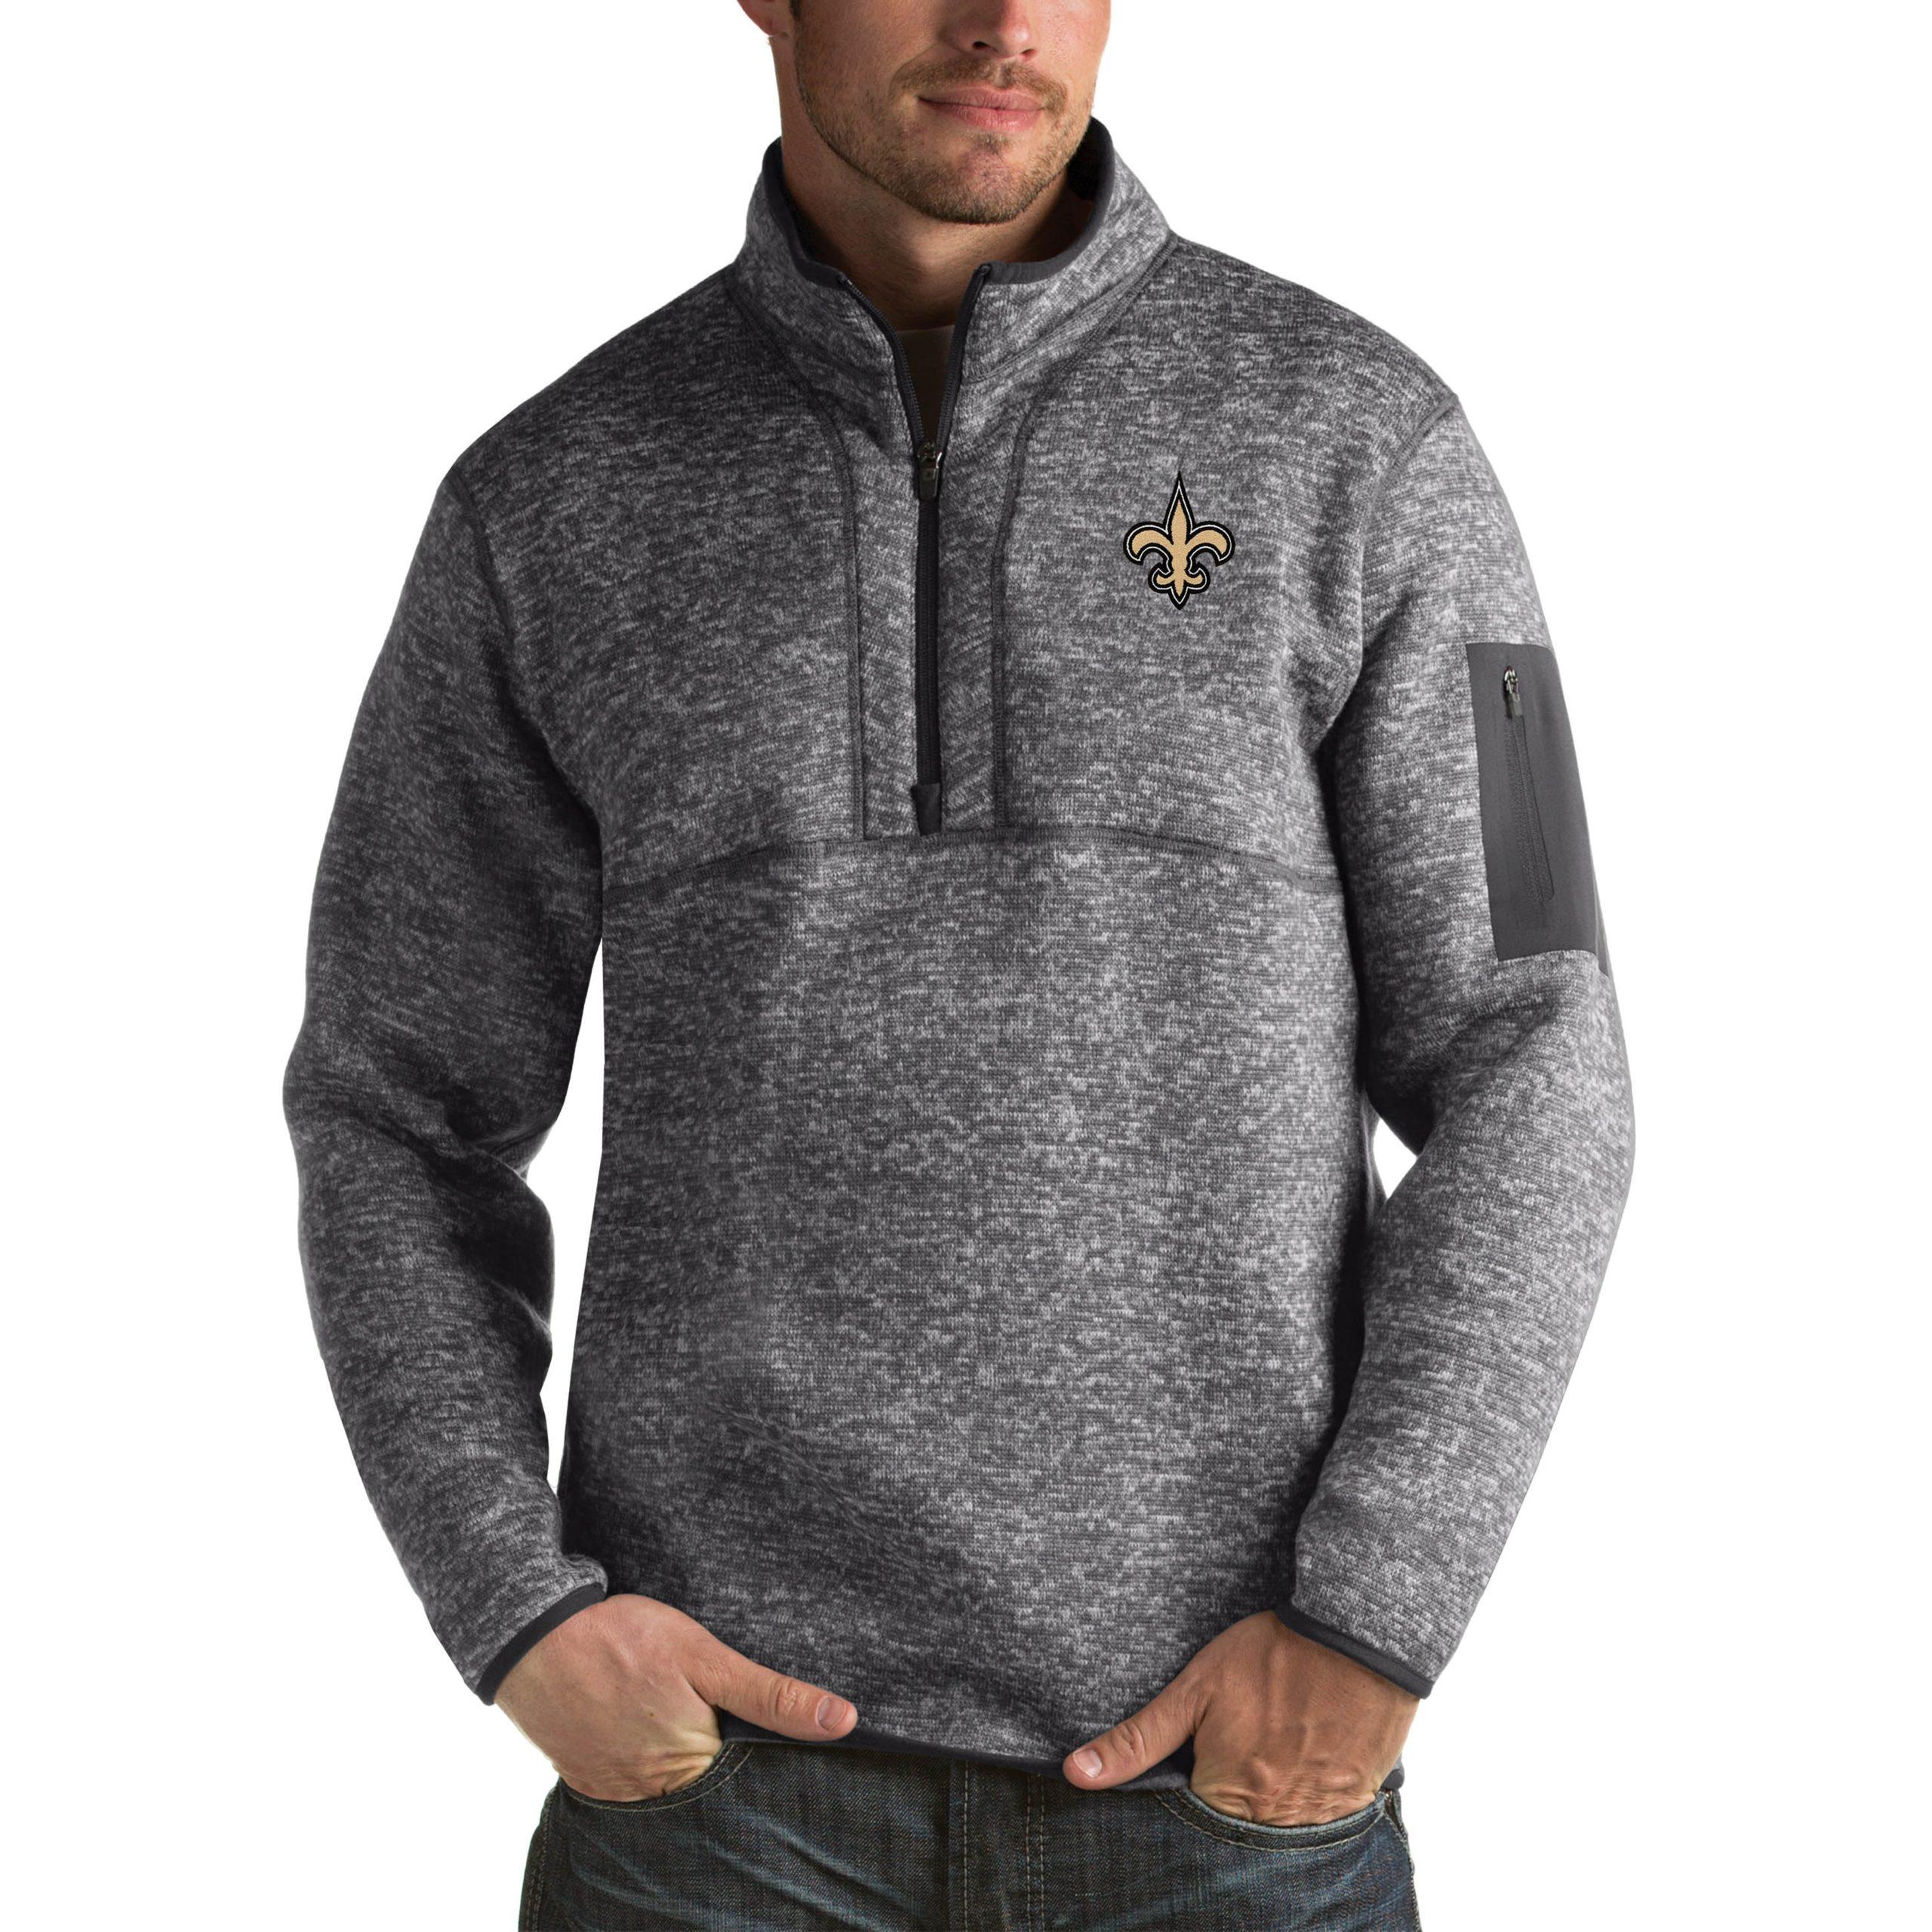 New Orleans Saints Antigua Fortune Big & Tall Quarter-Zip Pullover Jacket - Charcoal